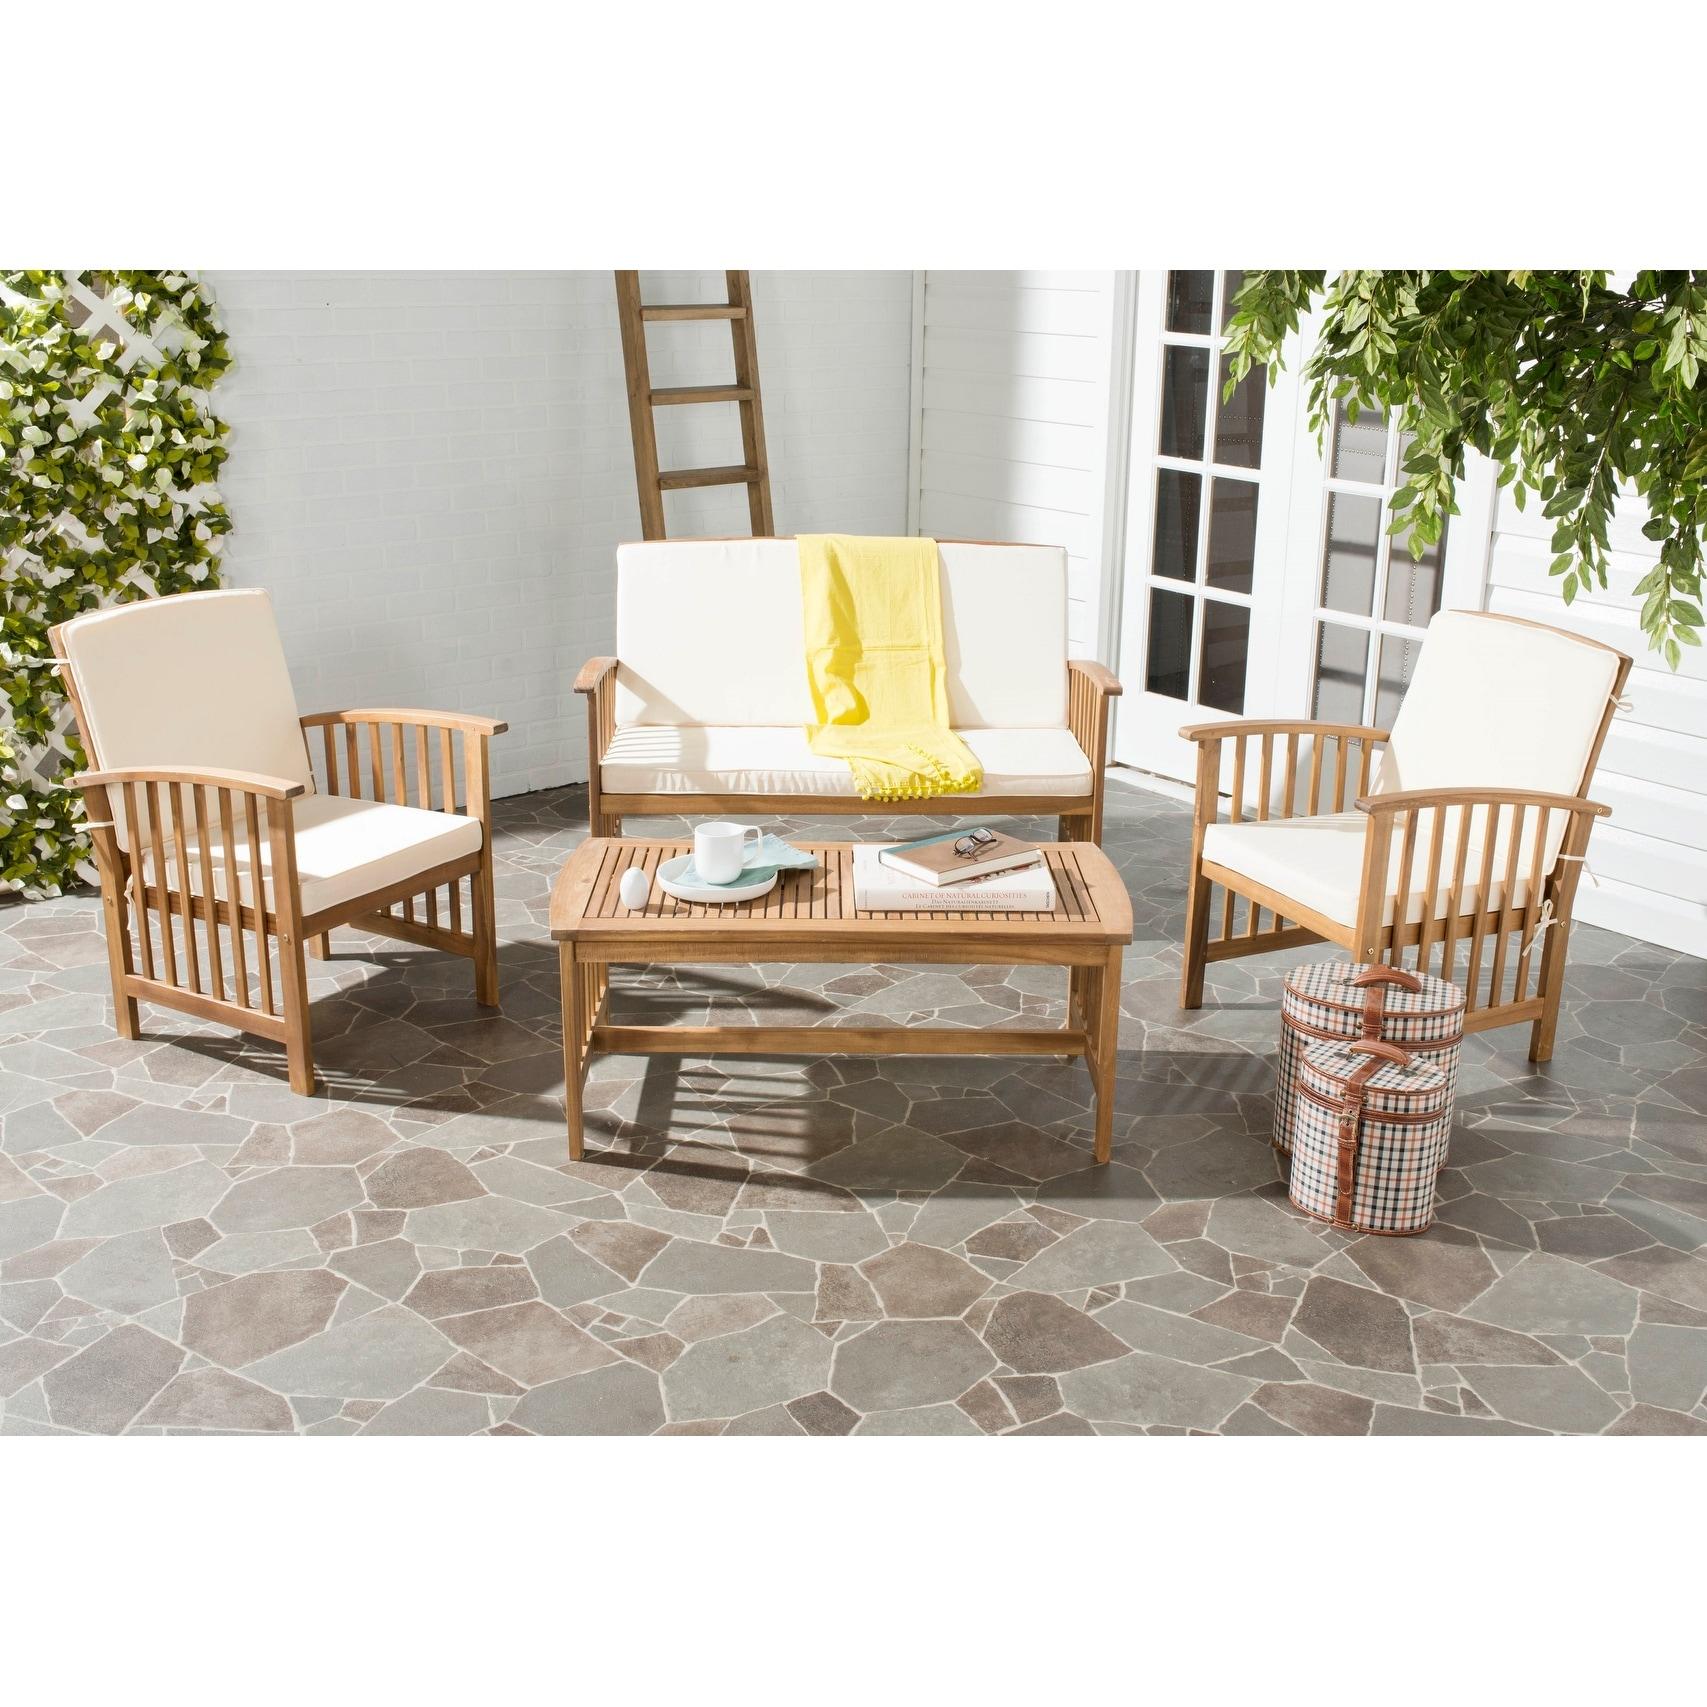 Safavieh Outdoor Living Rocklin 4-piece Outdoor Set | eBay on Safavieh Alda 4Pc Outdoor Set id=60391